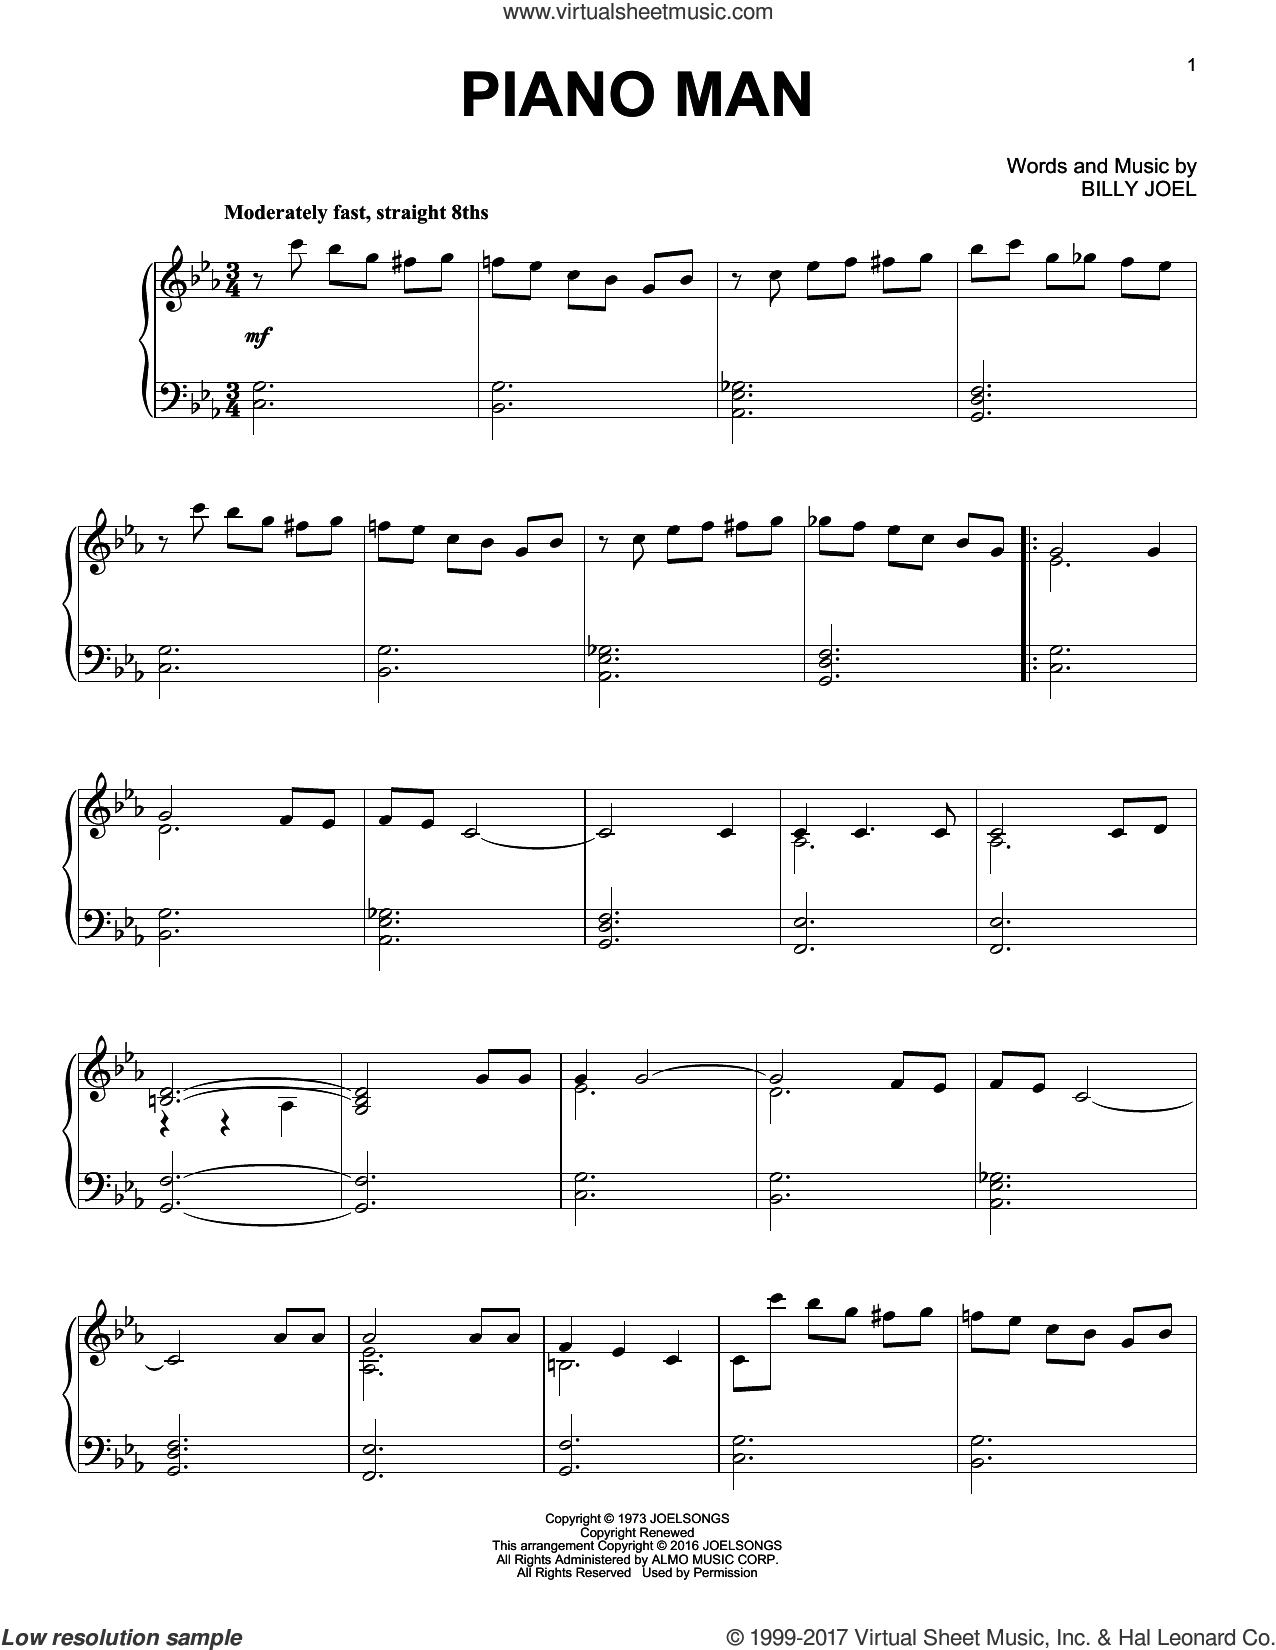 Piano Man [Jazz version] sheet music for piano solo by Billy Joel, intermediate skill level